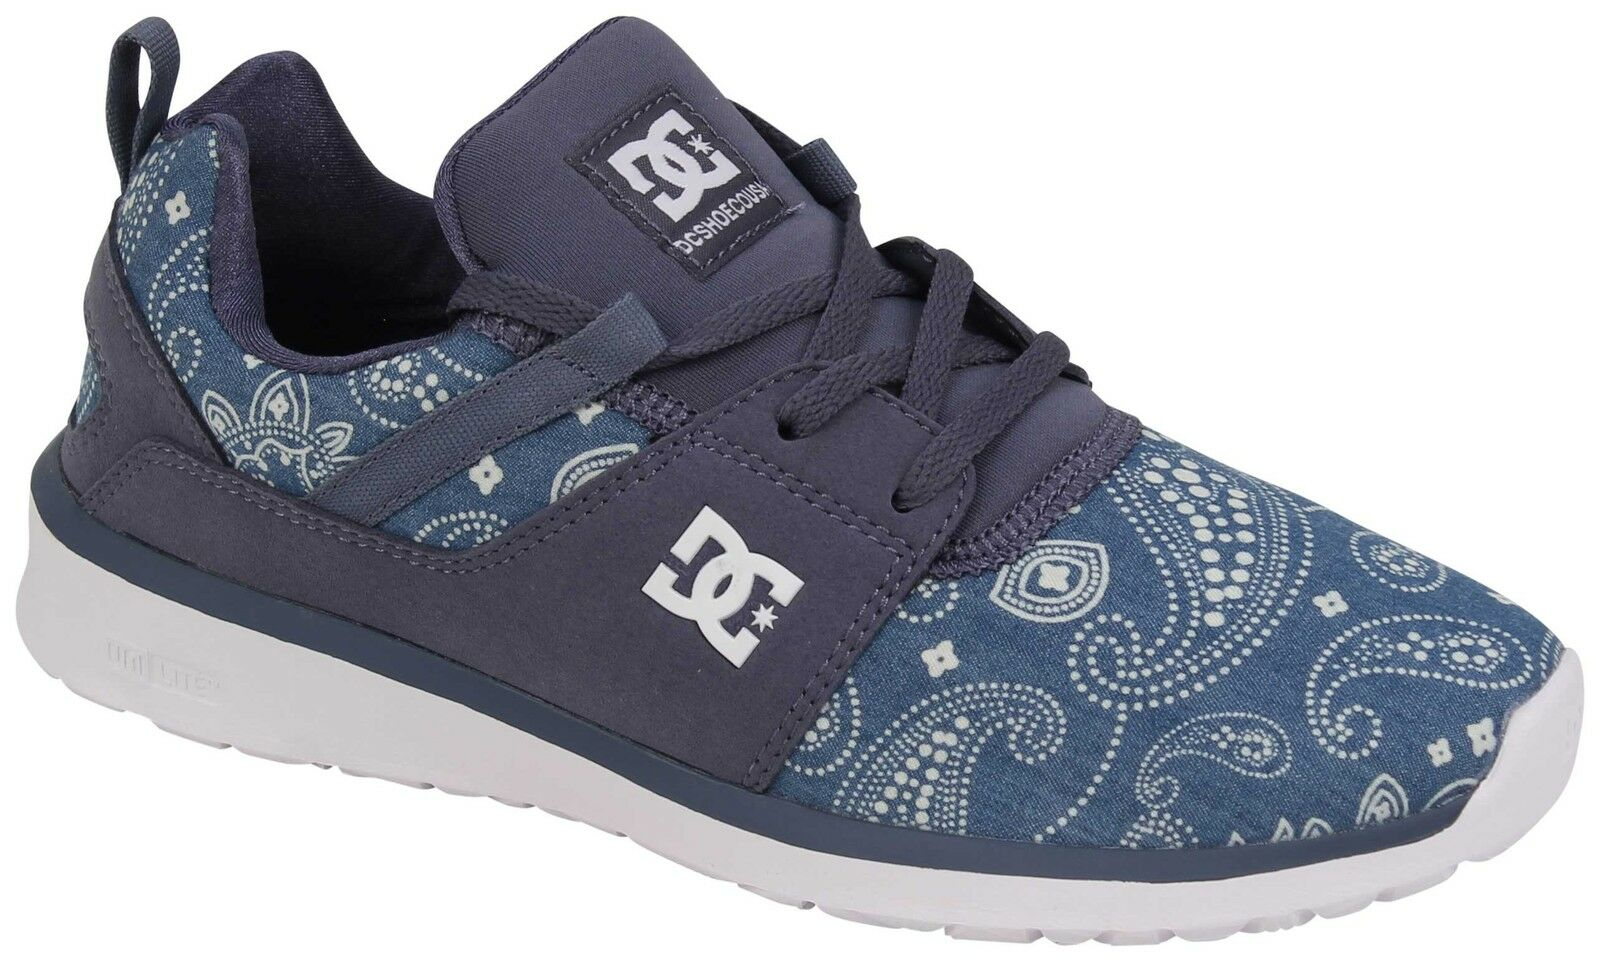 DC Women's Heathrow SE shoes - Navy   White - New